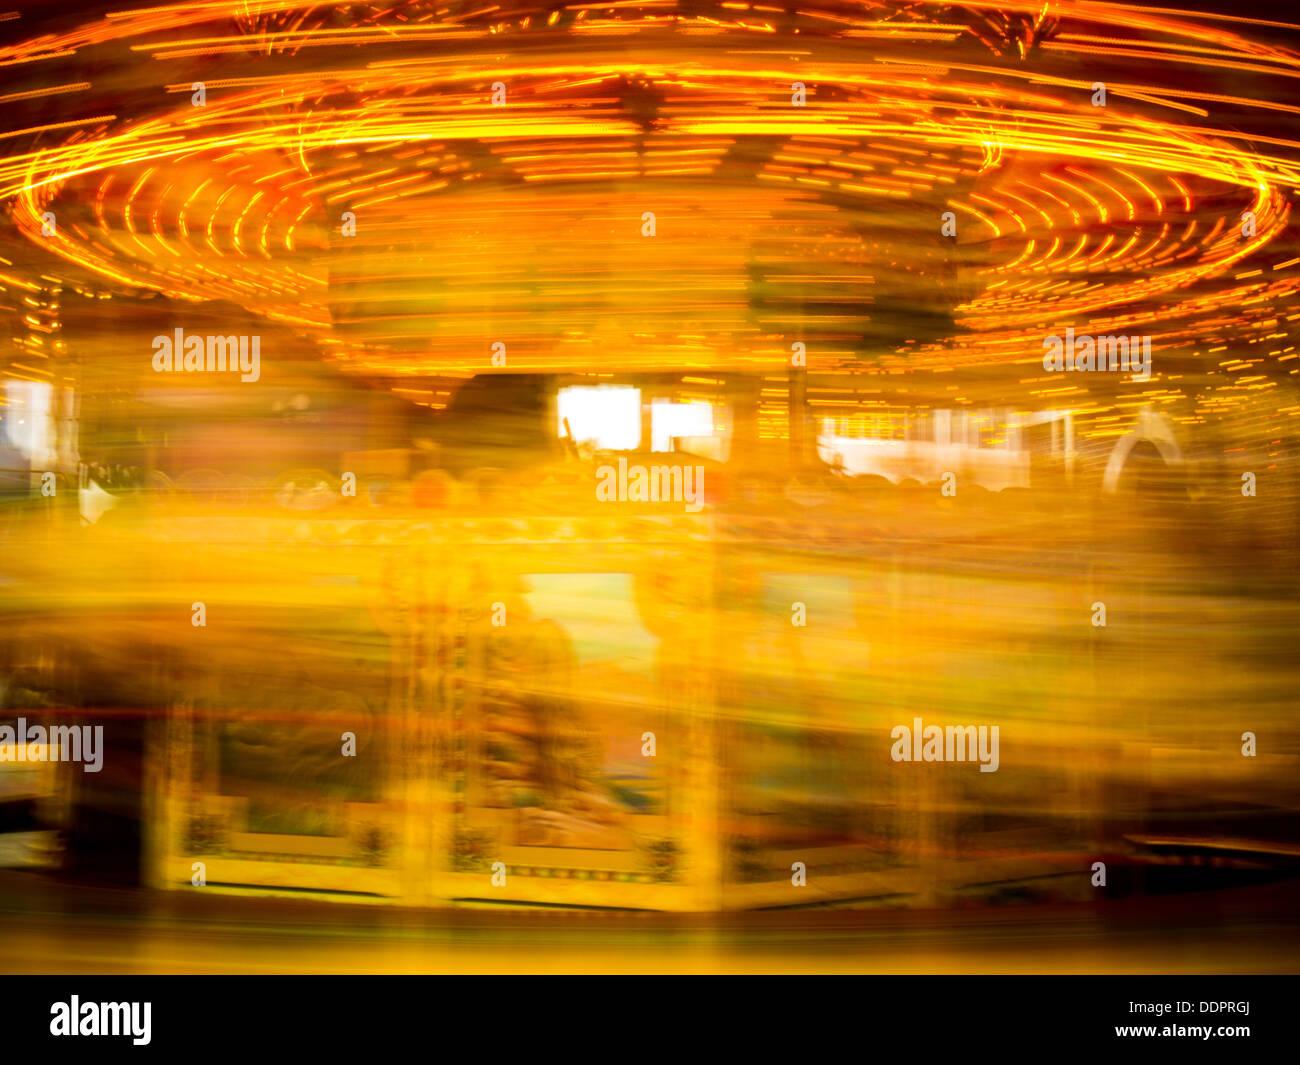 an-abstract-image-of-an-illuminated-caro